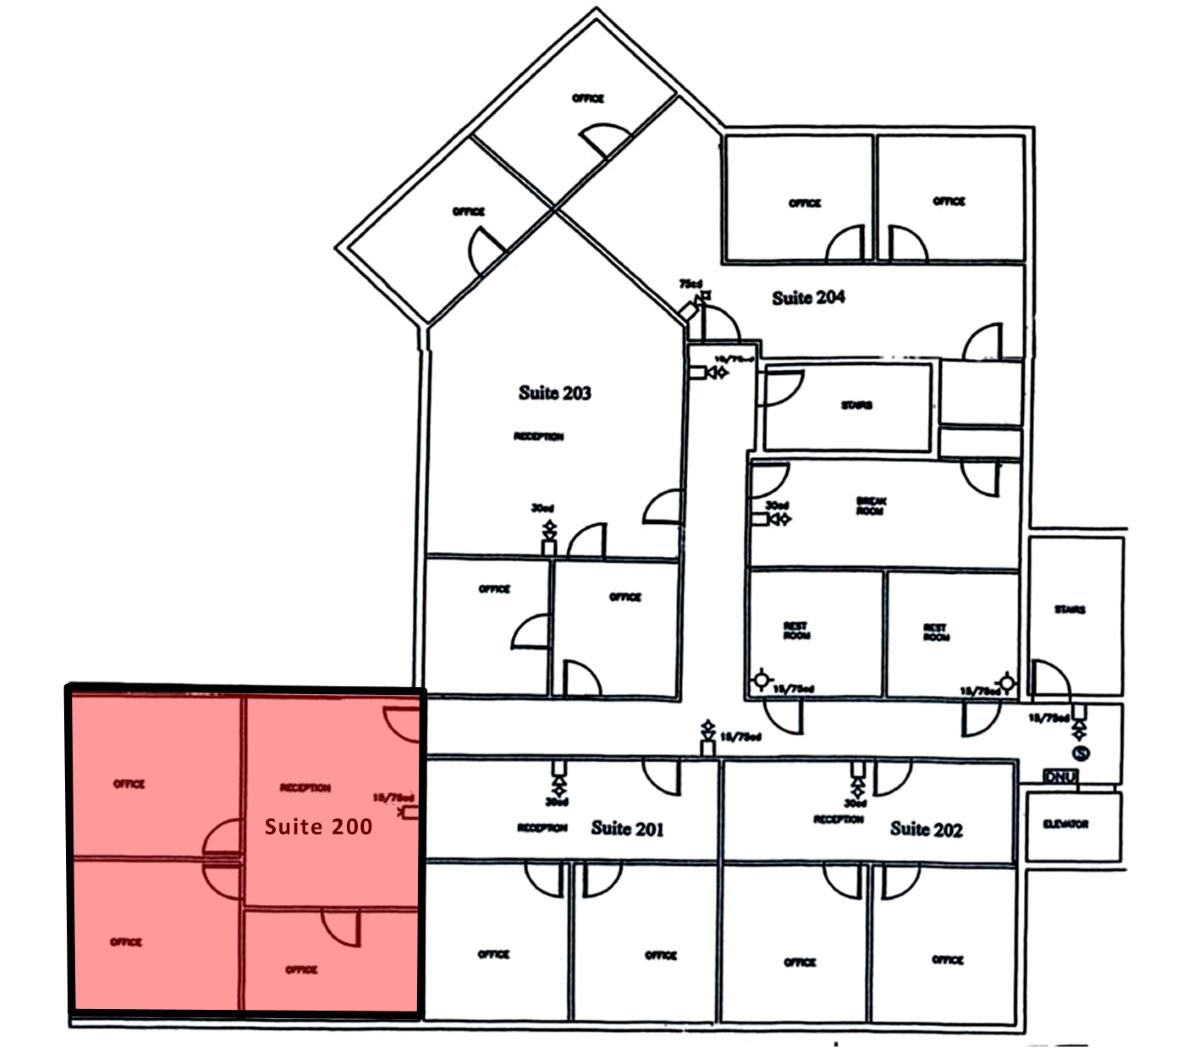 2nd_floor_ste_200_available.jpg